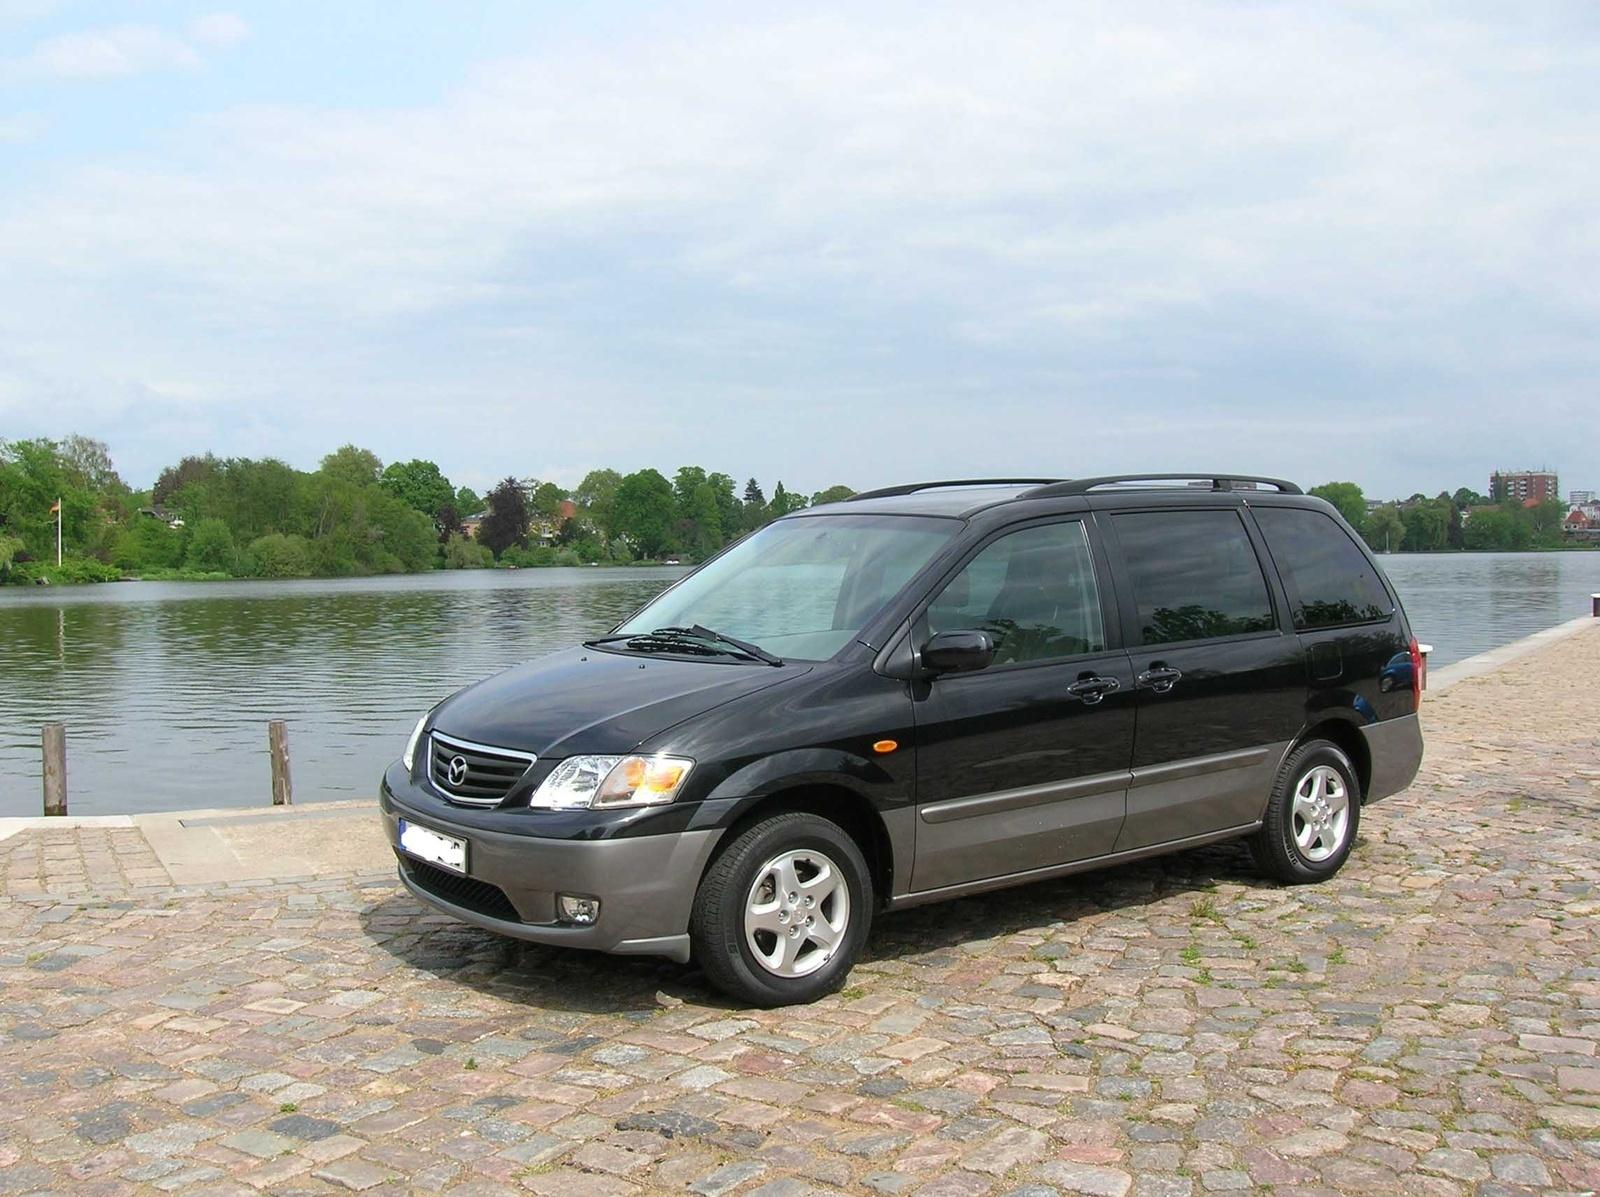 Mazda MPV - Overview - CarGurus on 1991 kia sedona minivan, 1991 chevrolet lumina minivan, 1991 toyota previa minivan,